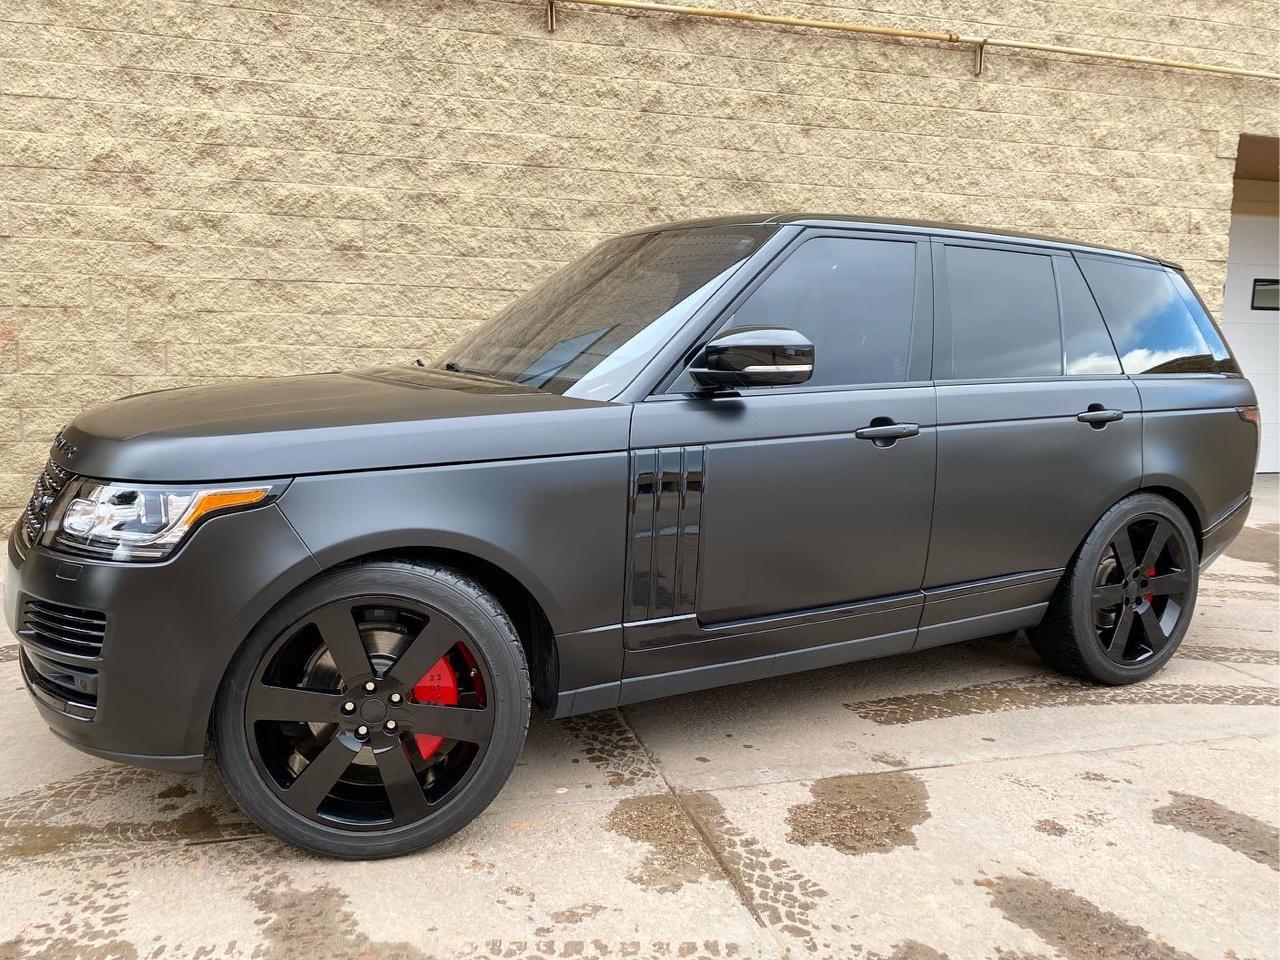 Range Rover blacked out. Satin black vinyl wrap, gloss black trim, powder coated wheels. Back view